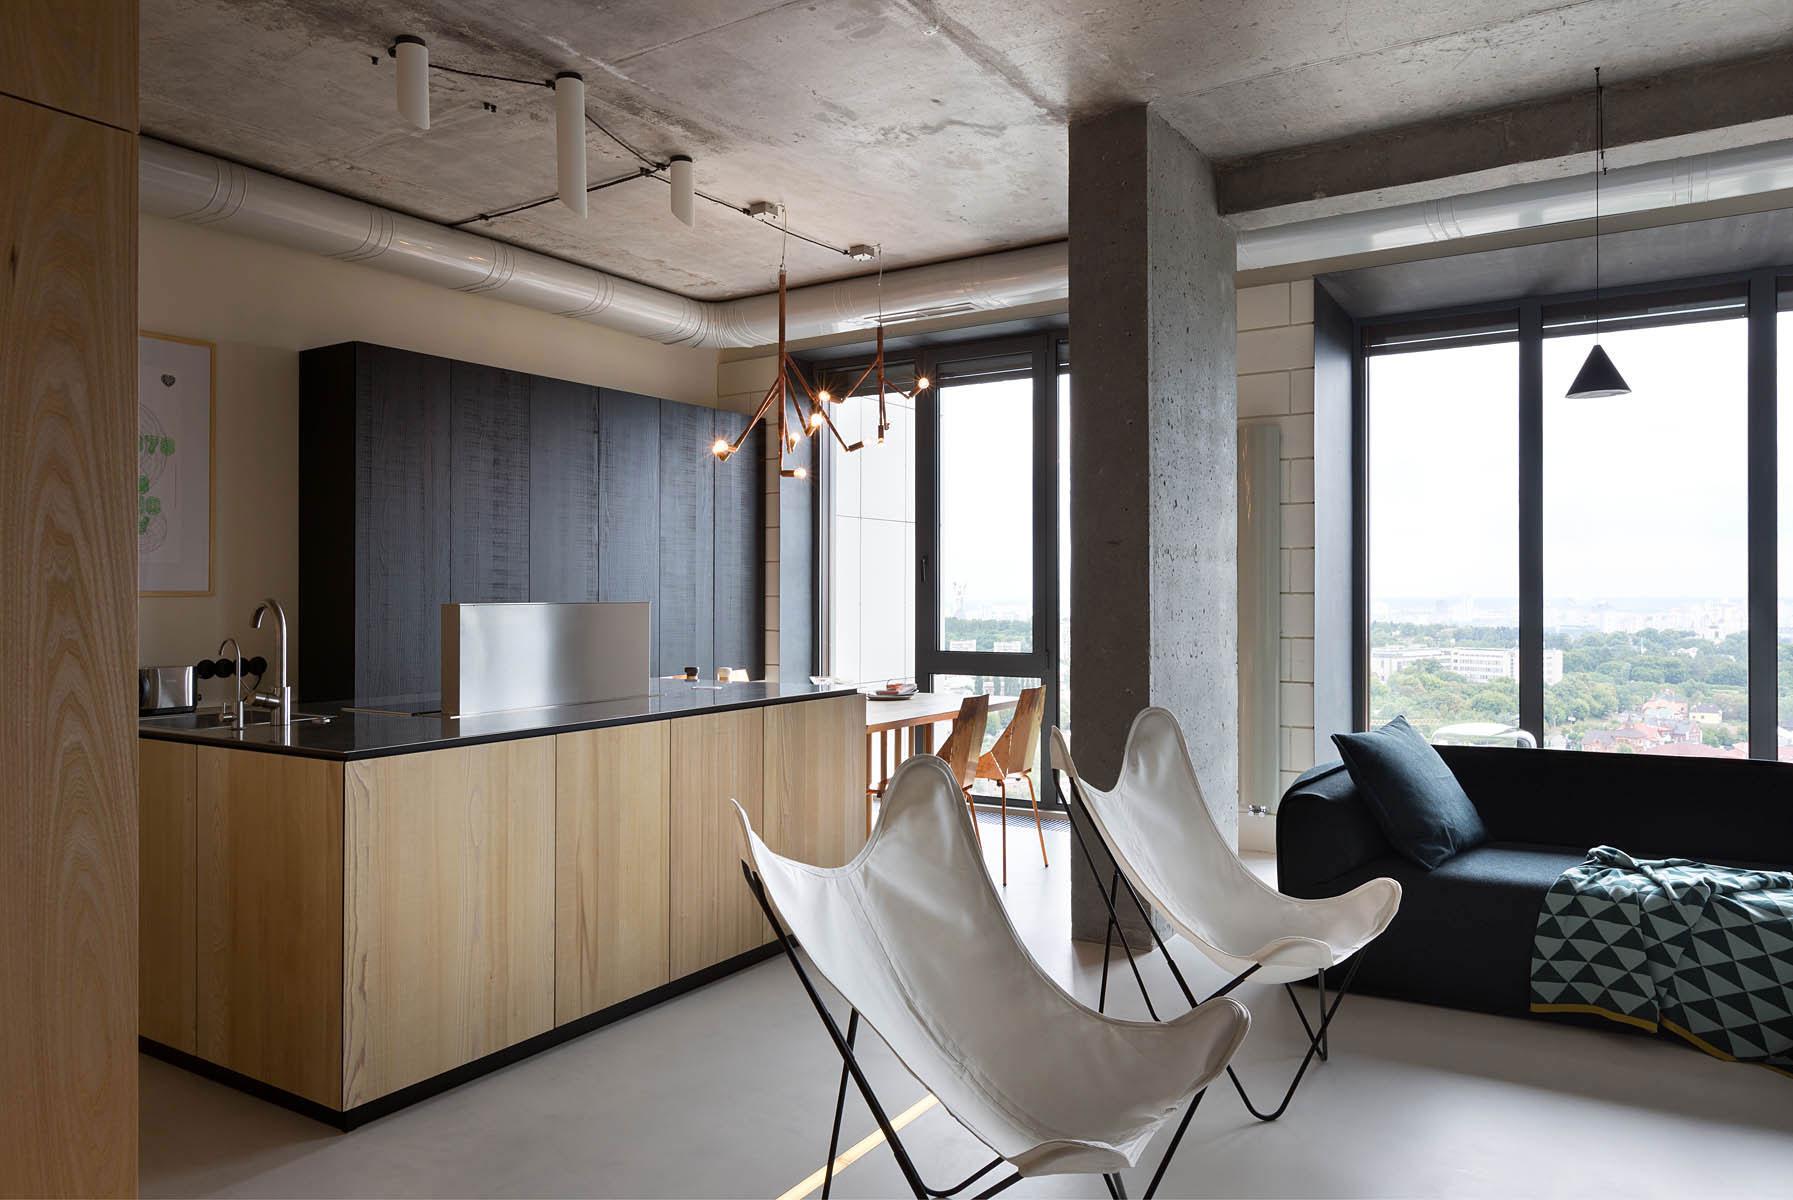 Warm industrial living room -  Elegant 30th Level Npl Penthouse By Olga Akulova Design 13